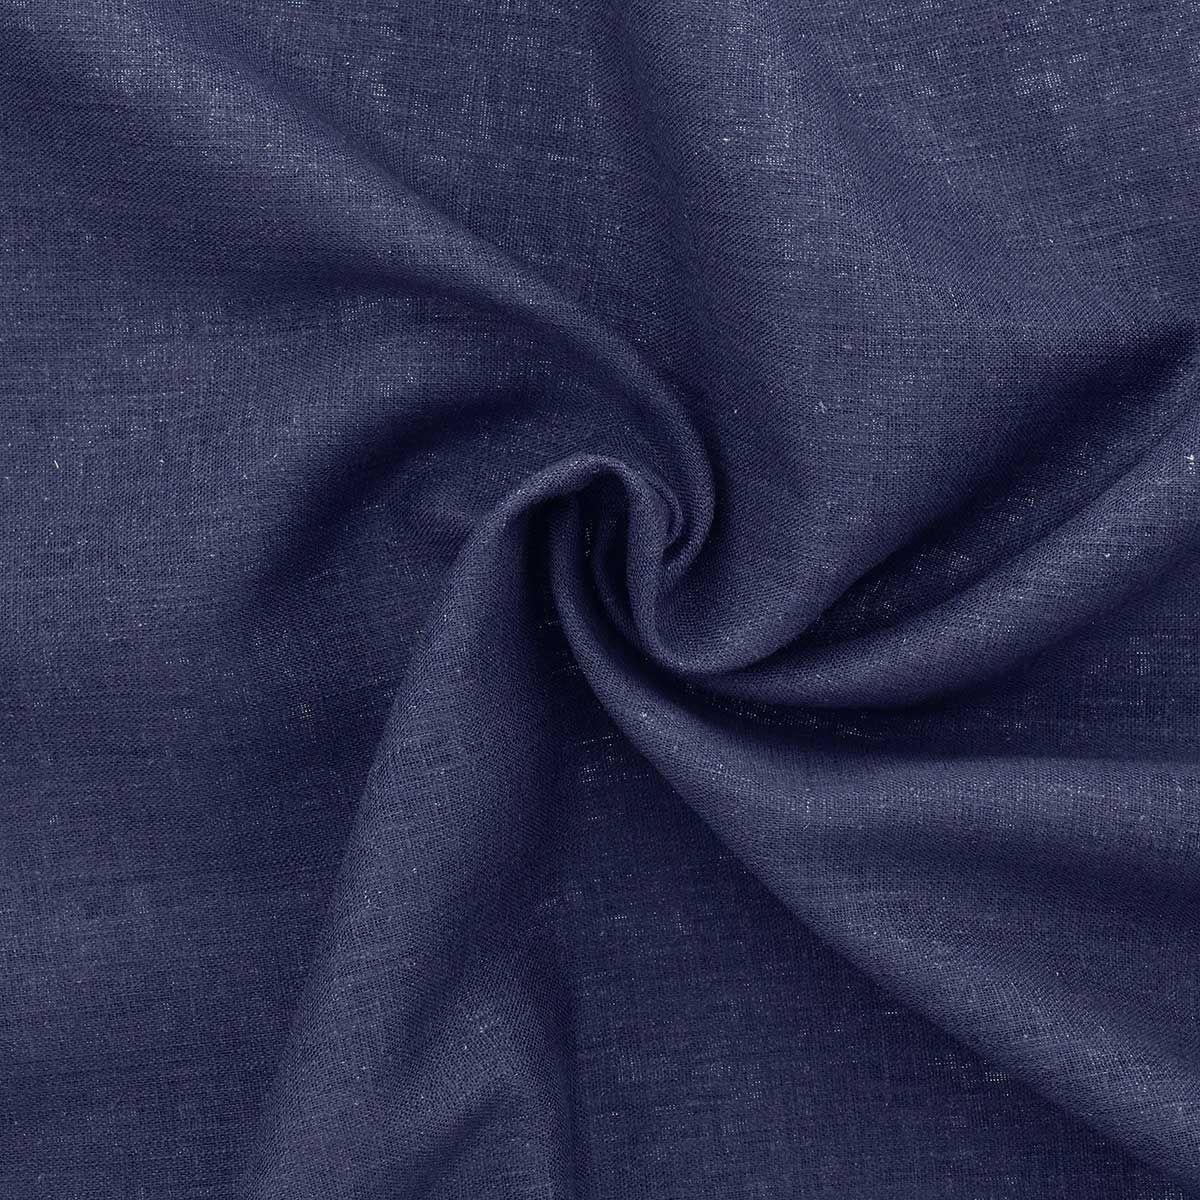 Tissu lin viscose - Bleu marine